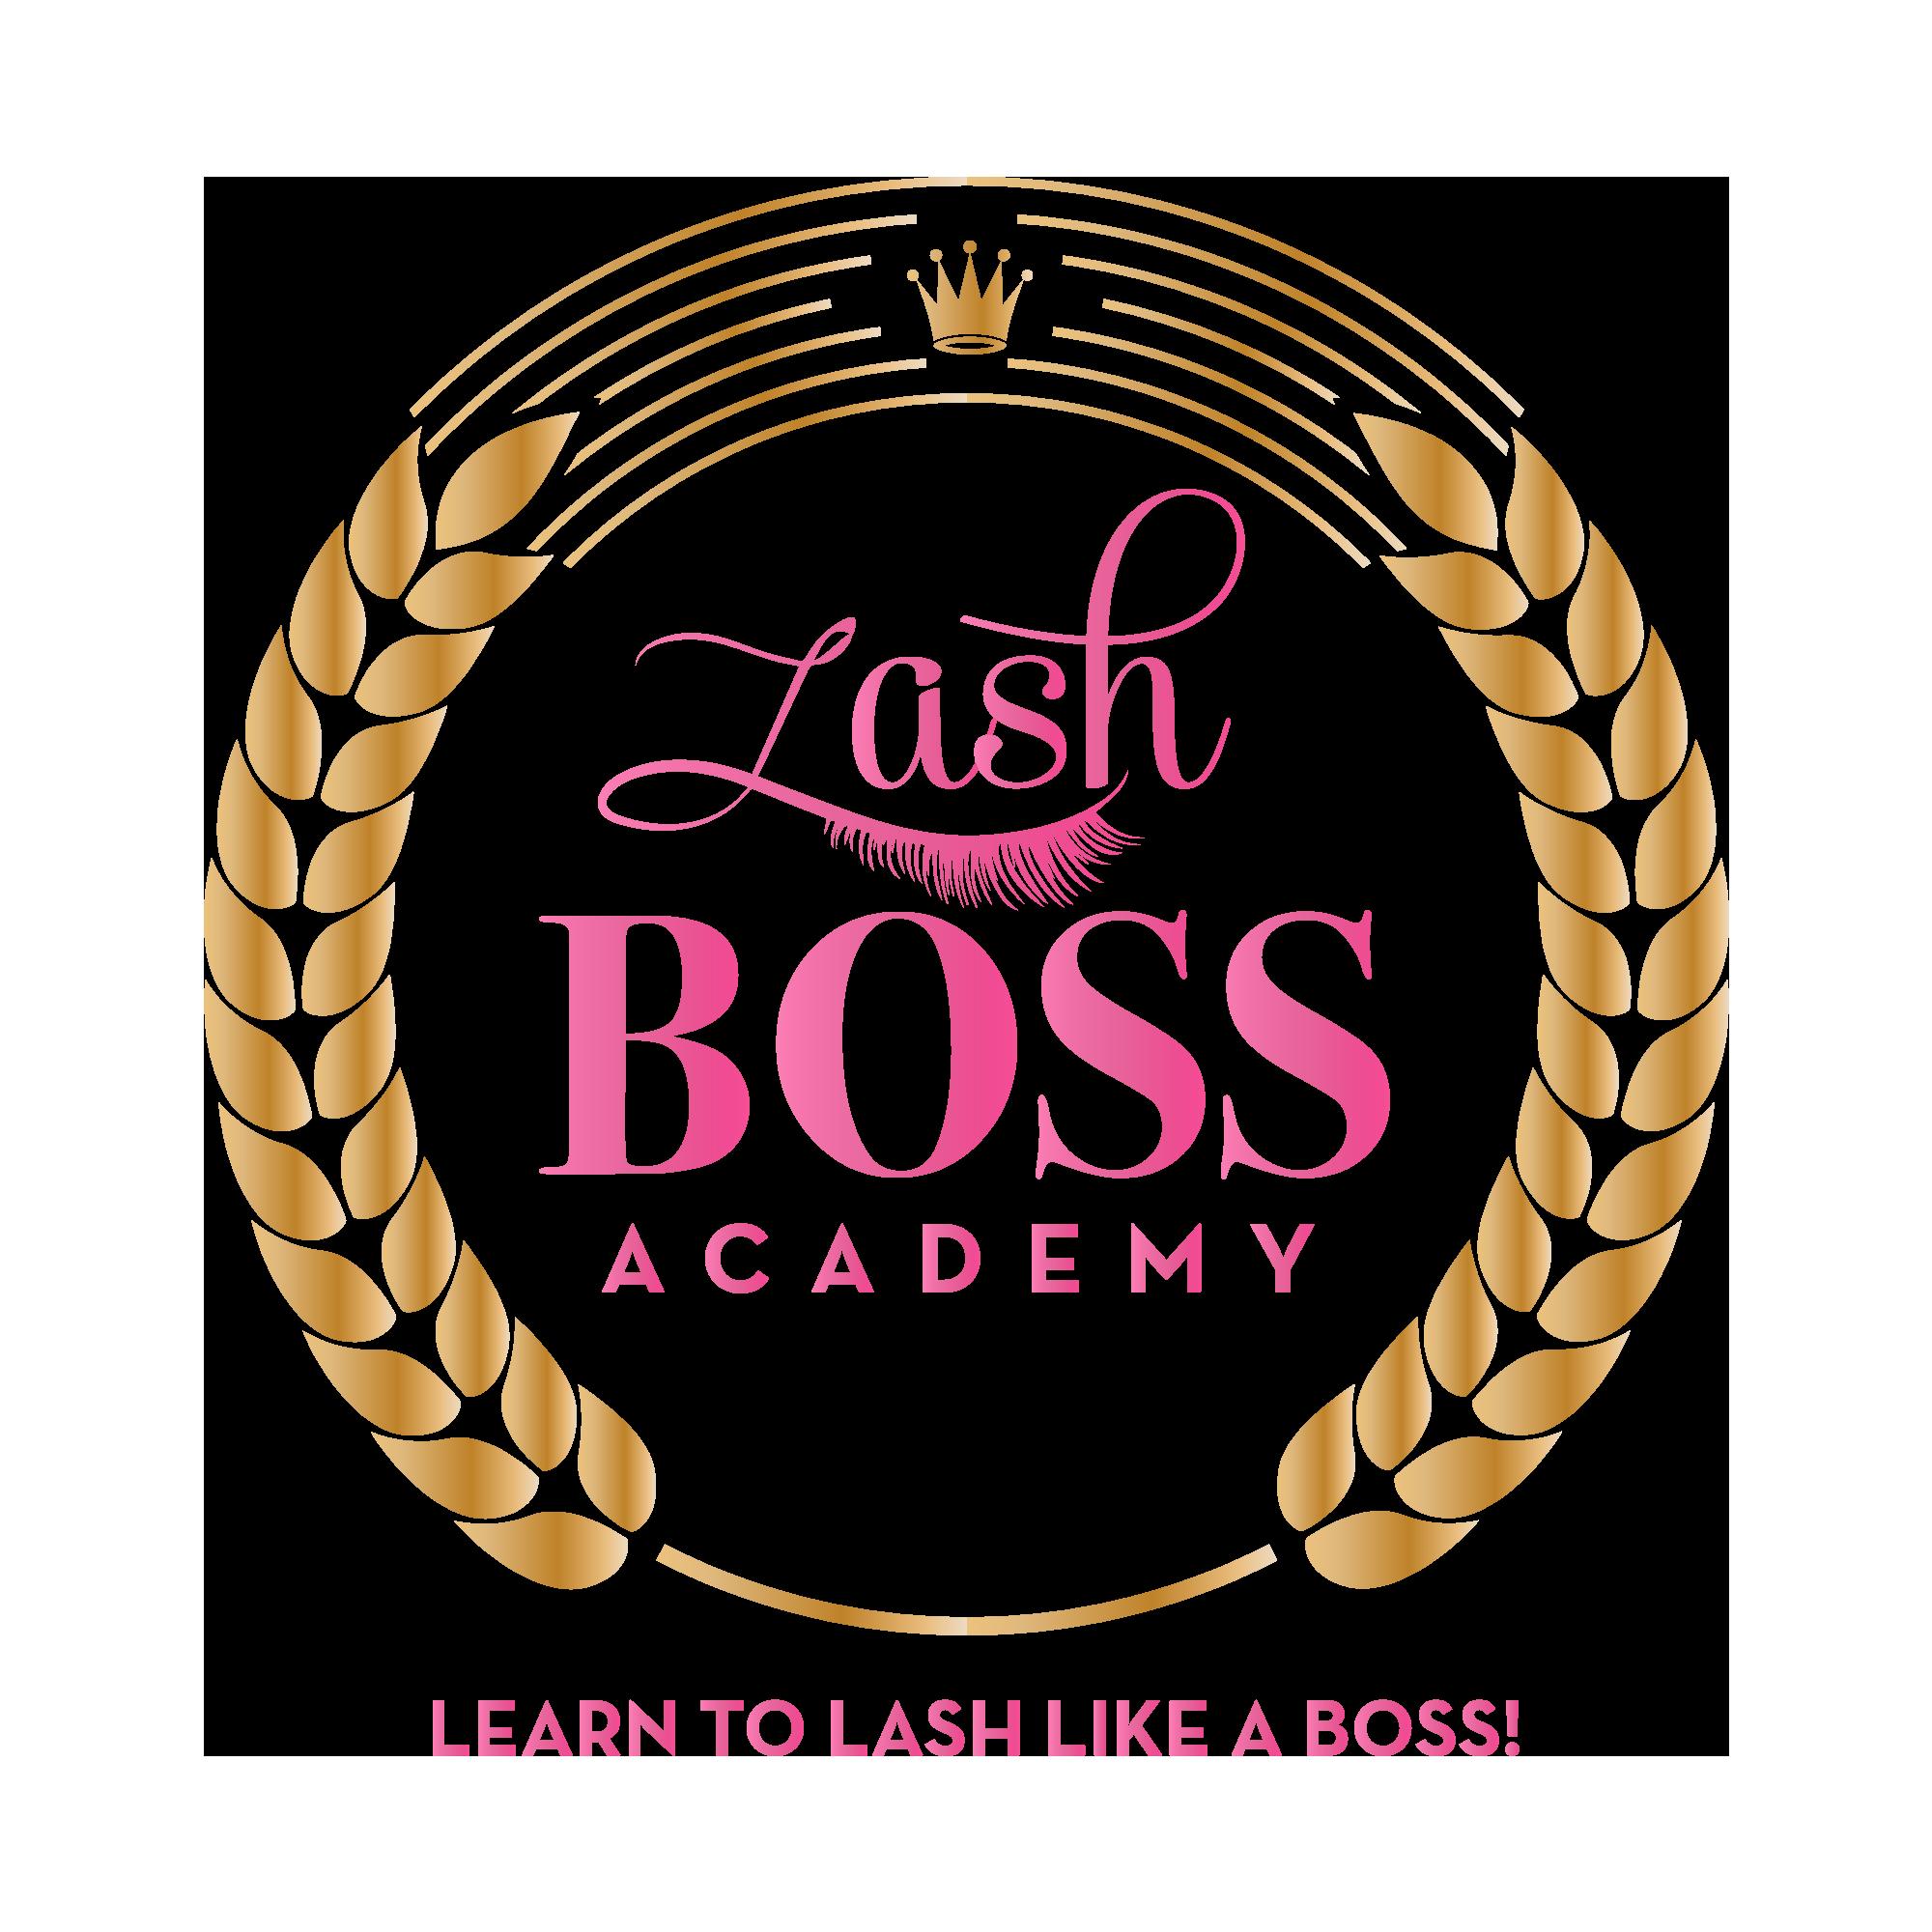 Lash Boss Academy